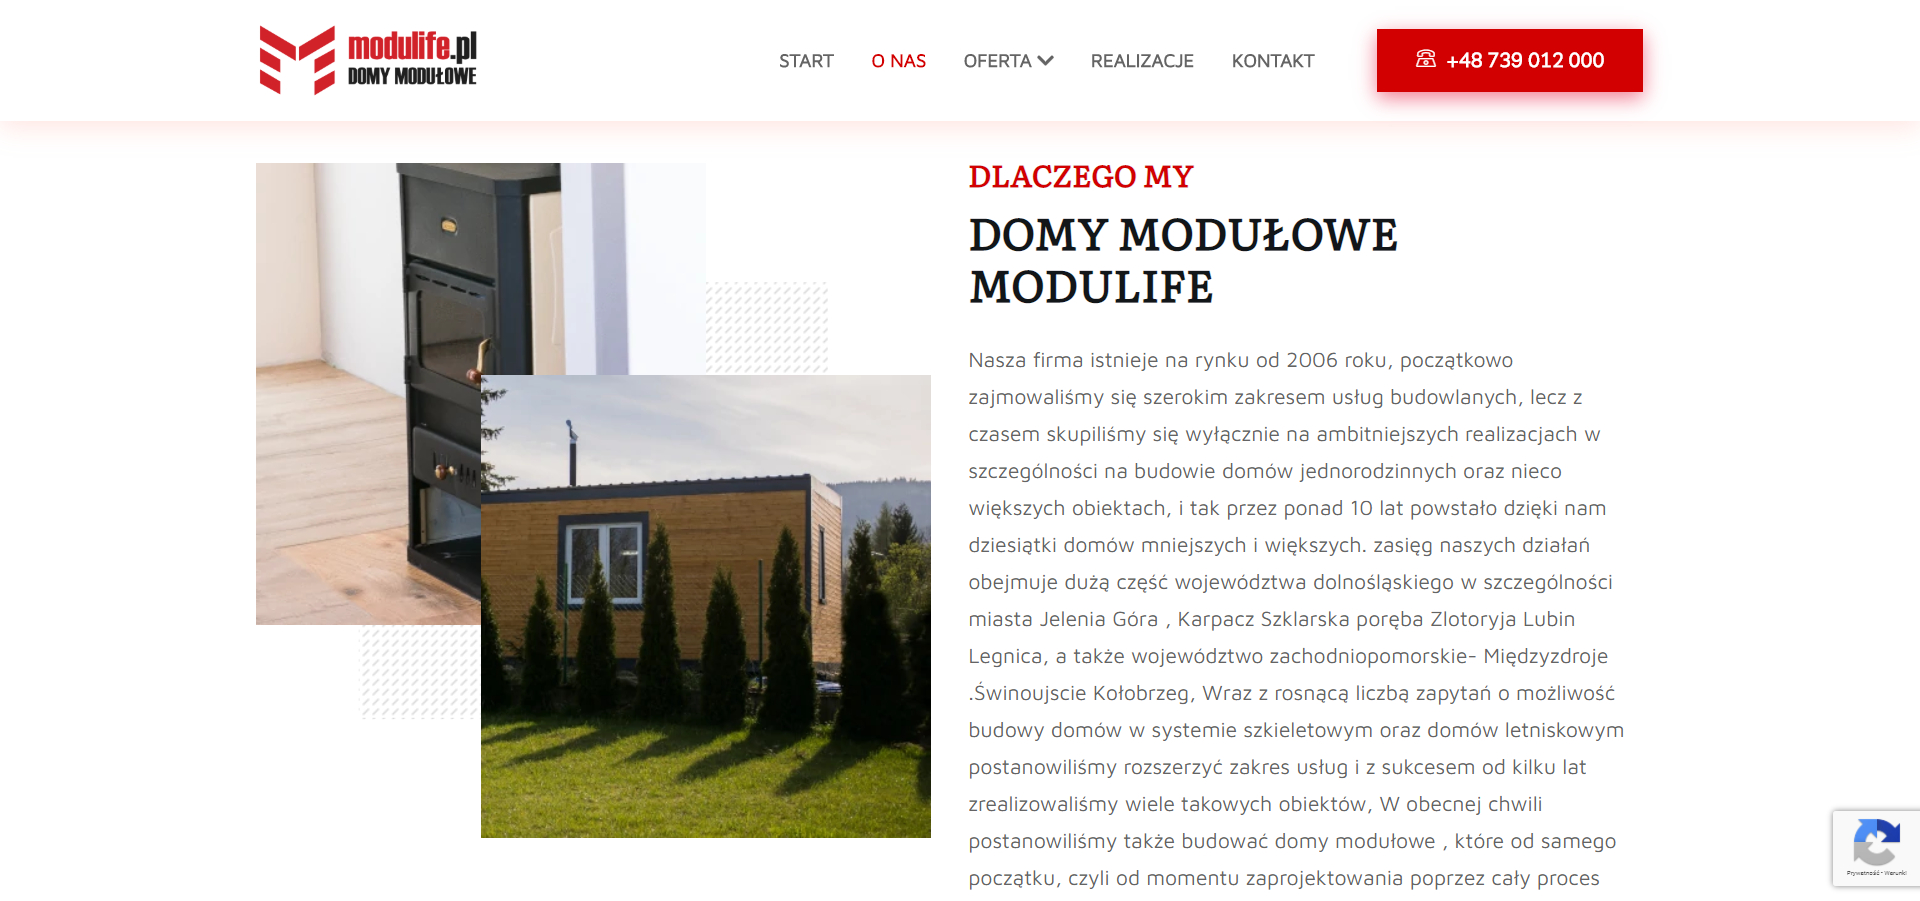 Tworzenie stron internetowych - modulife.pl